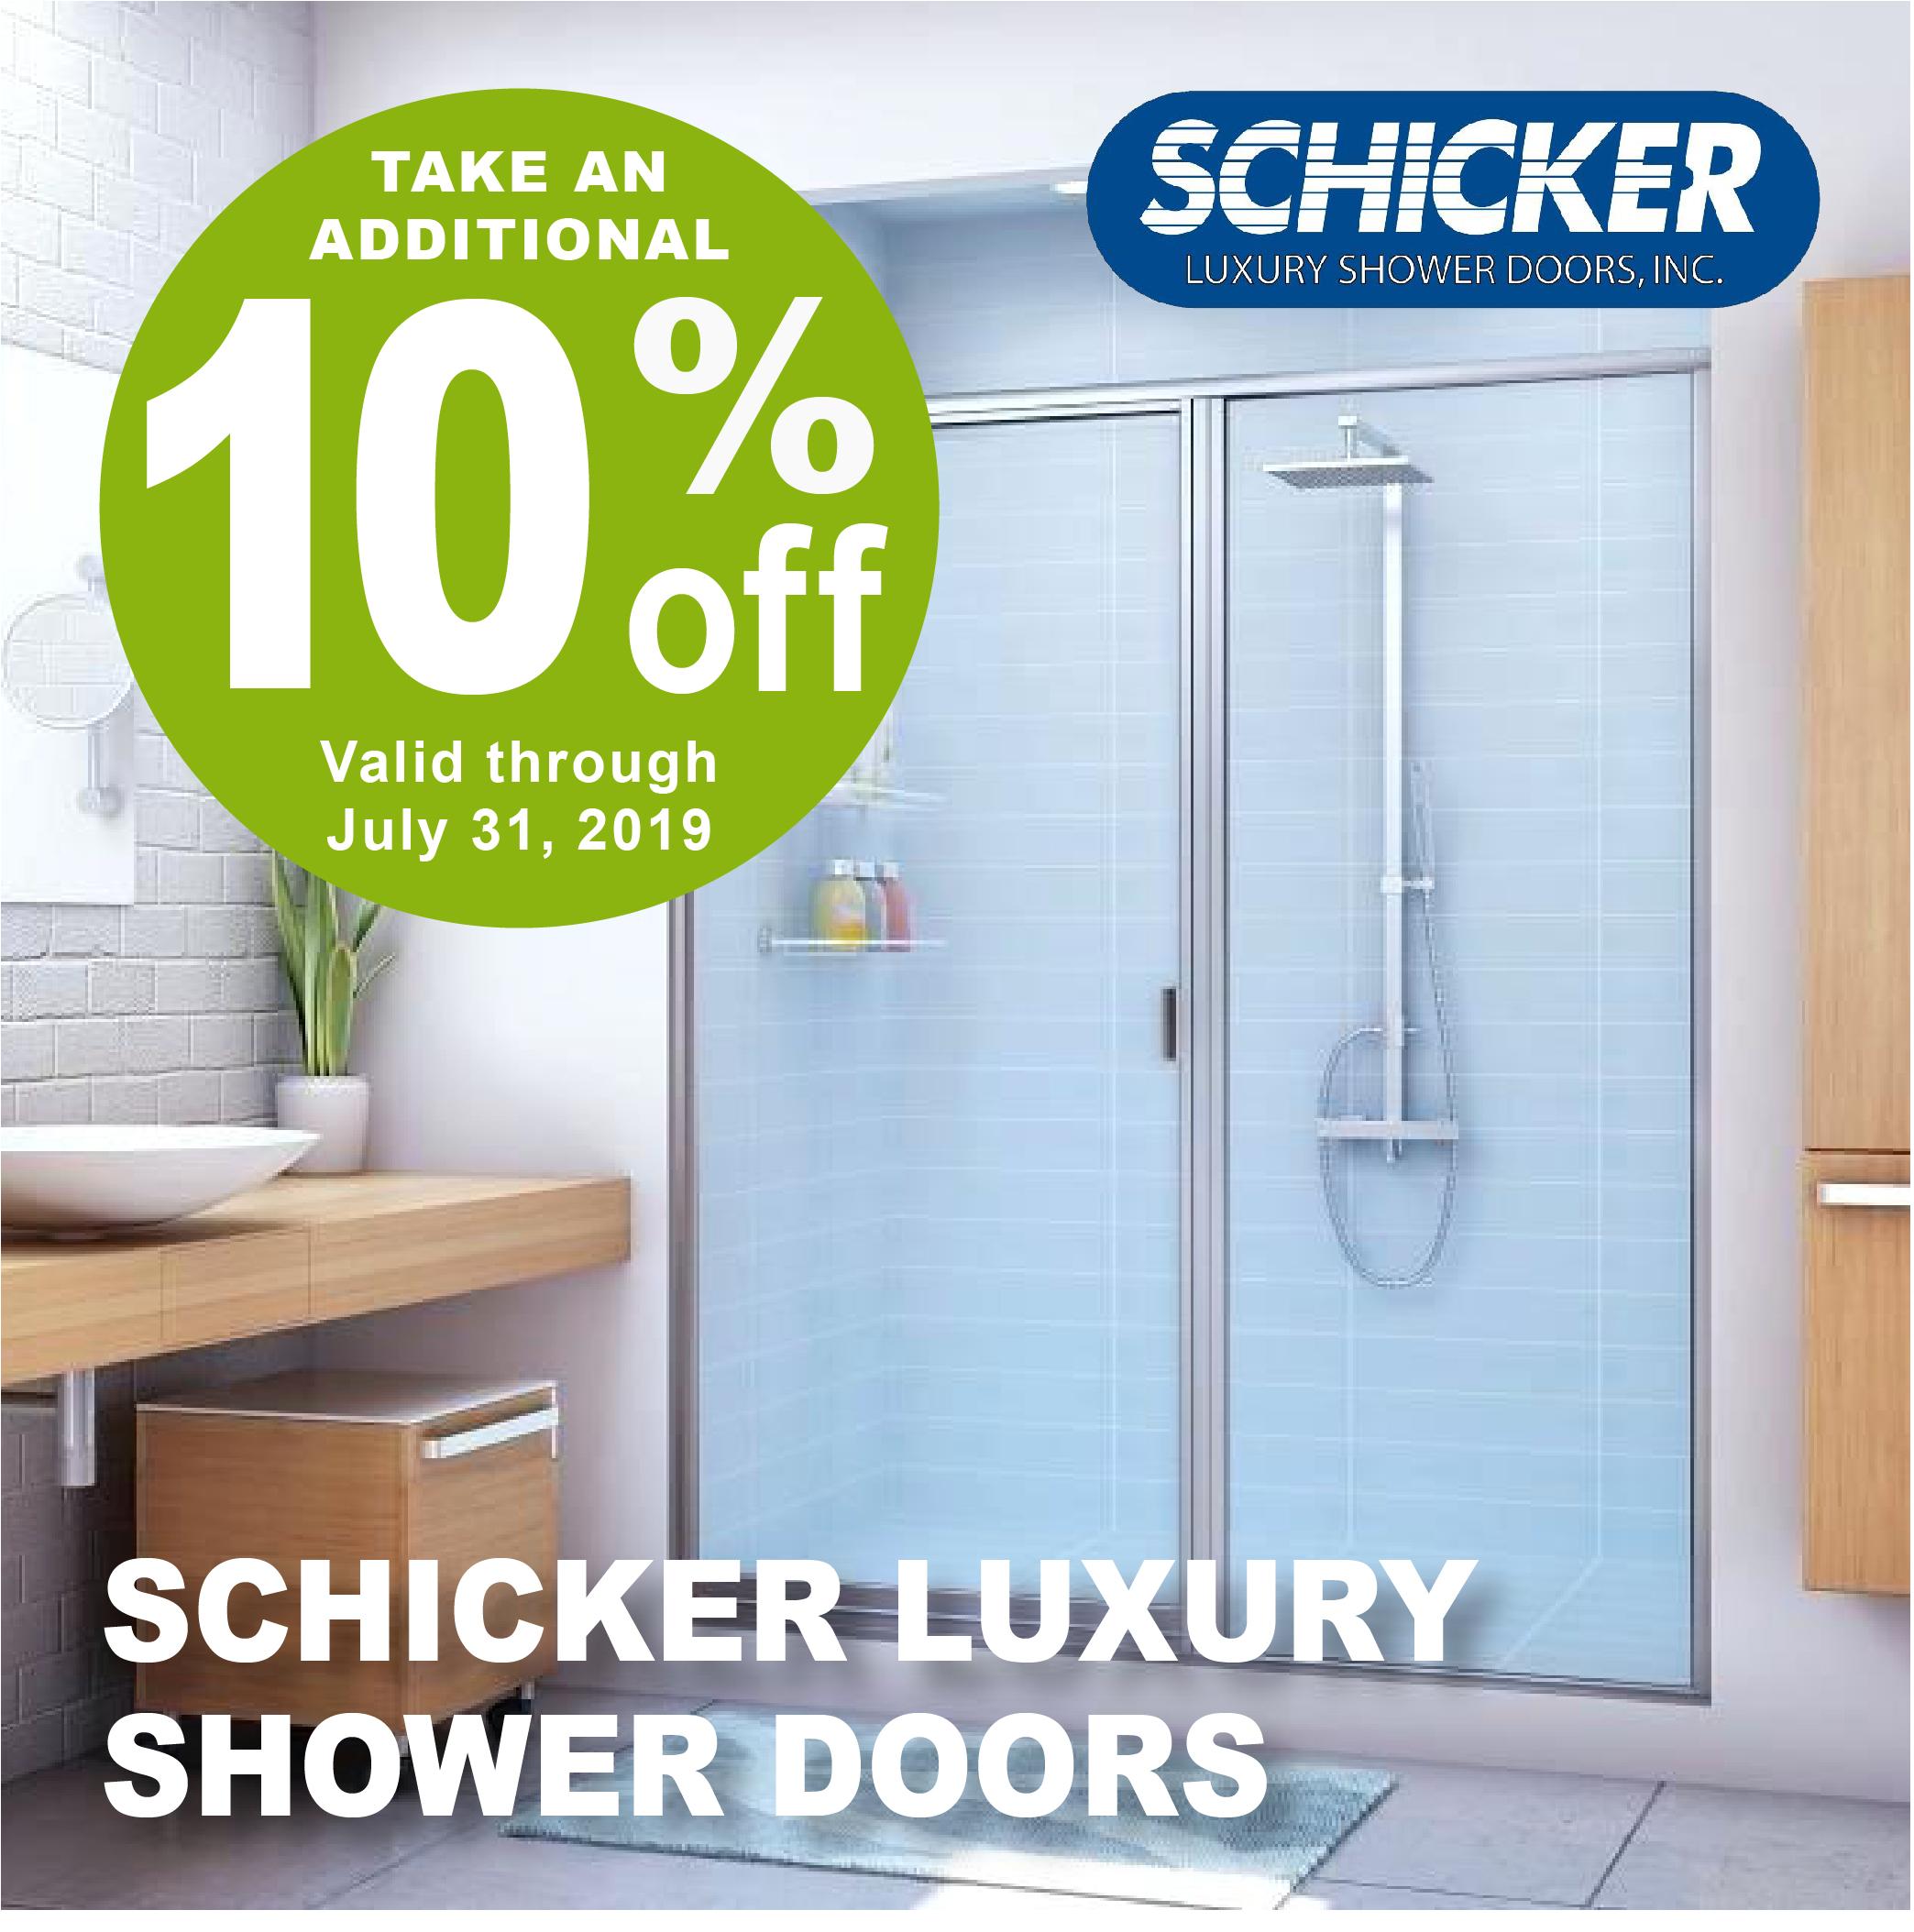 10% OFF SCHICKER LUXURY SHOWER DOORS THROUGHOUT JULY